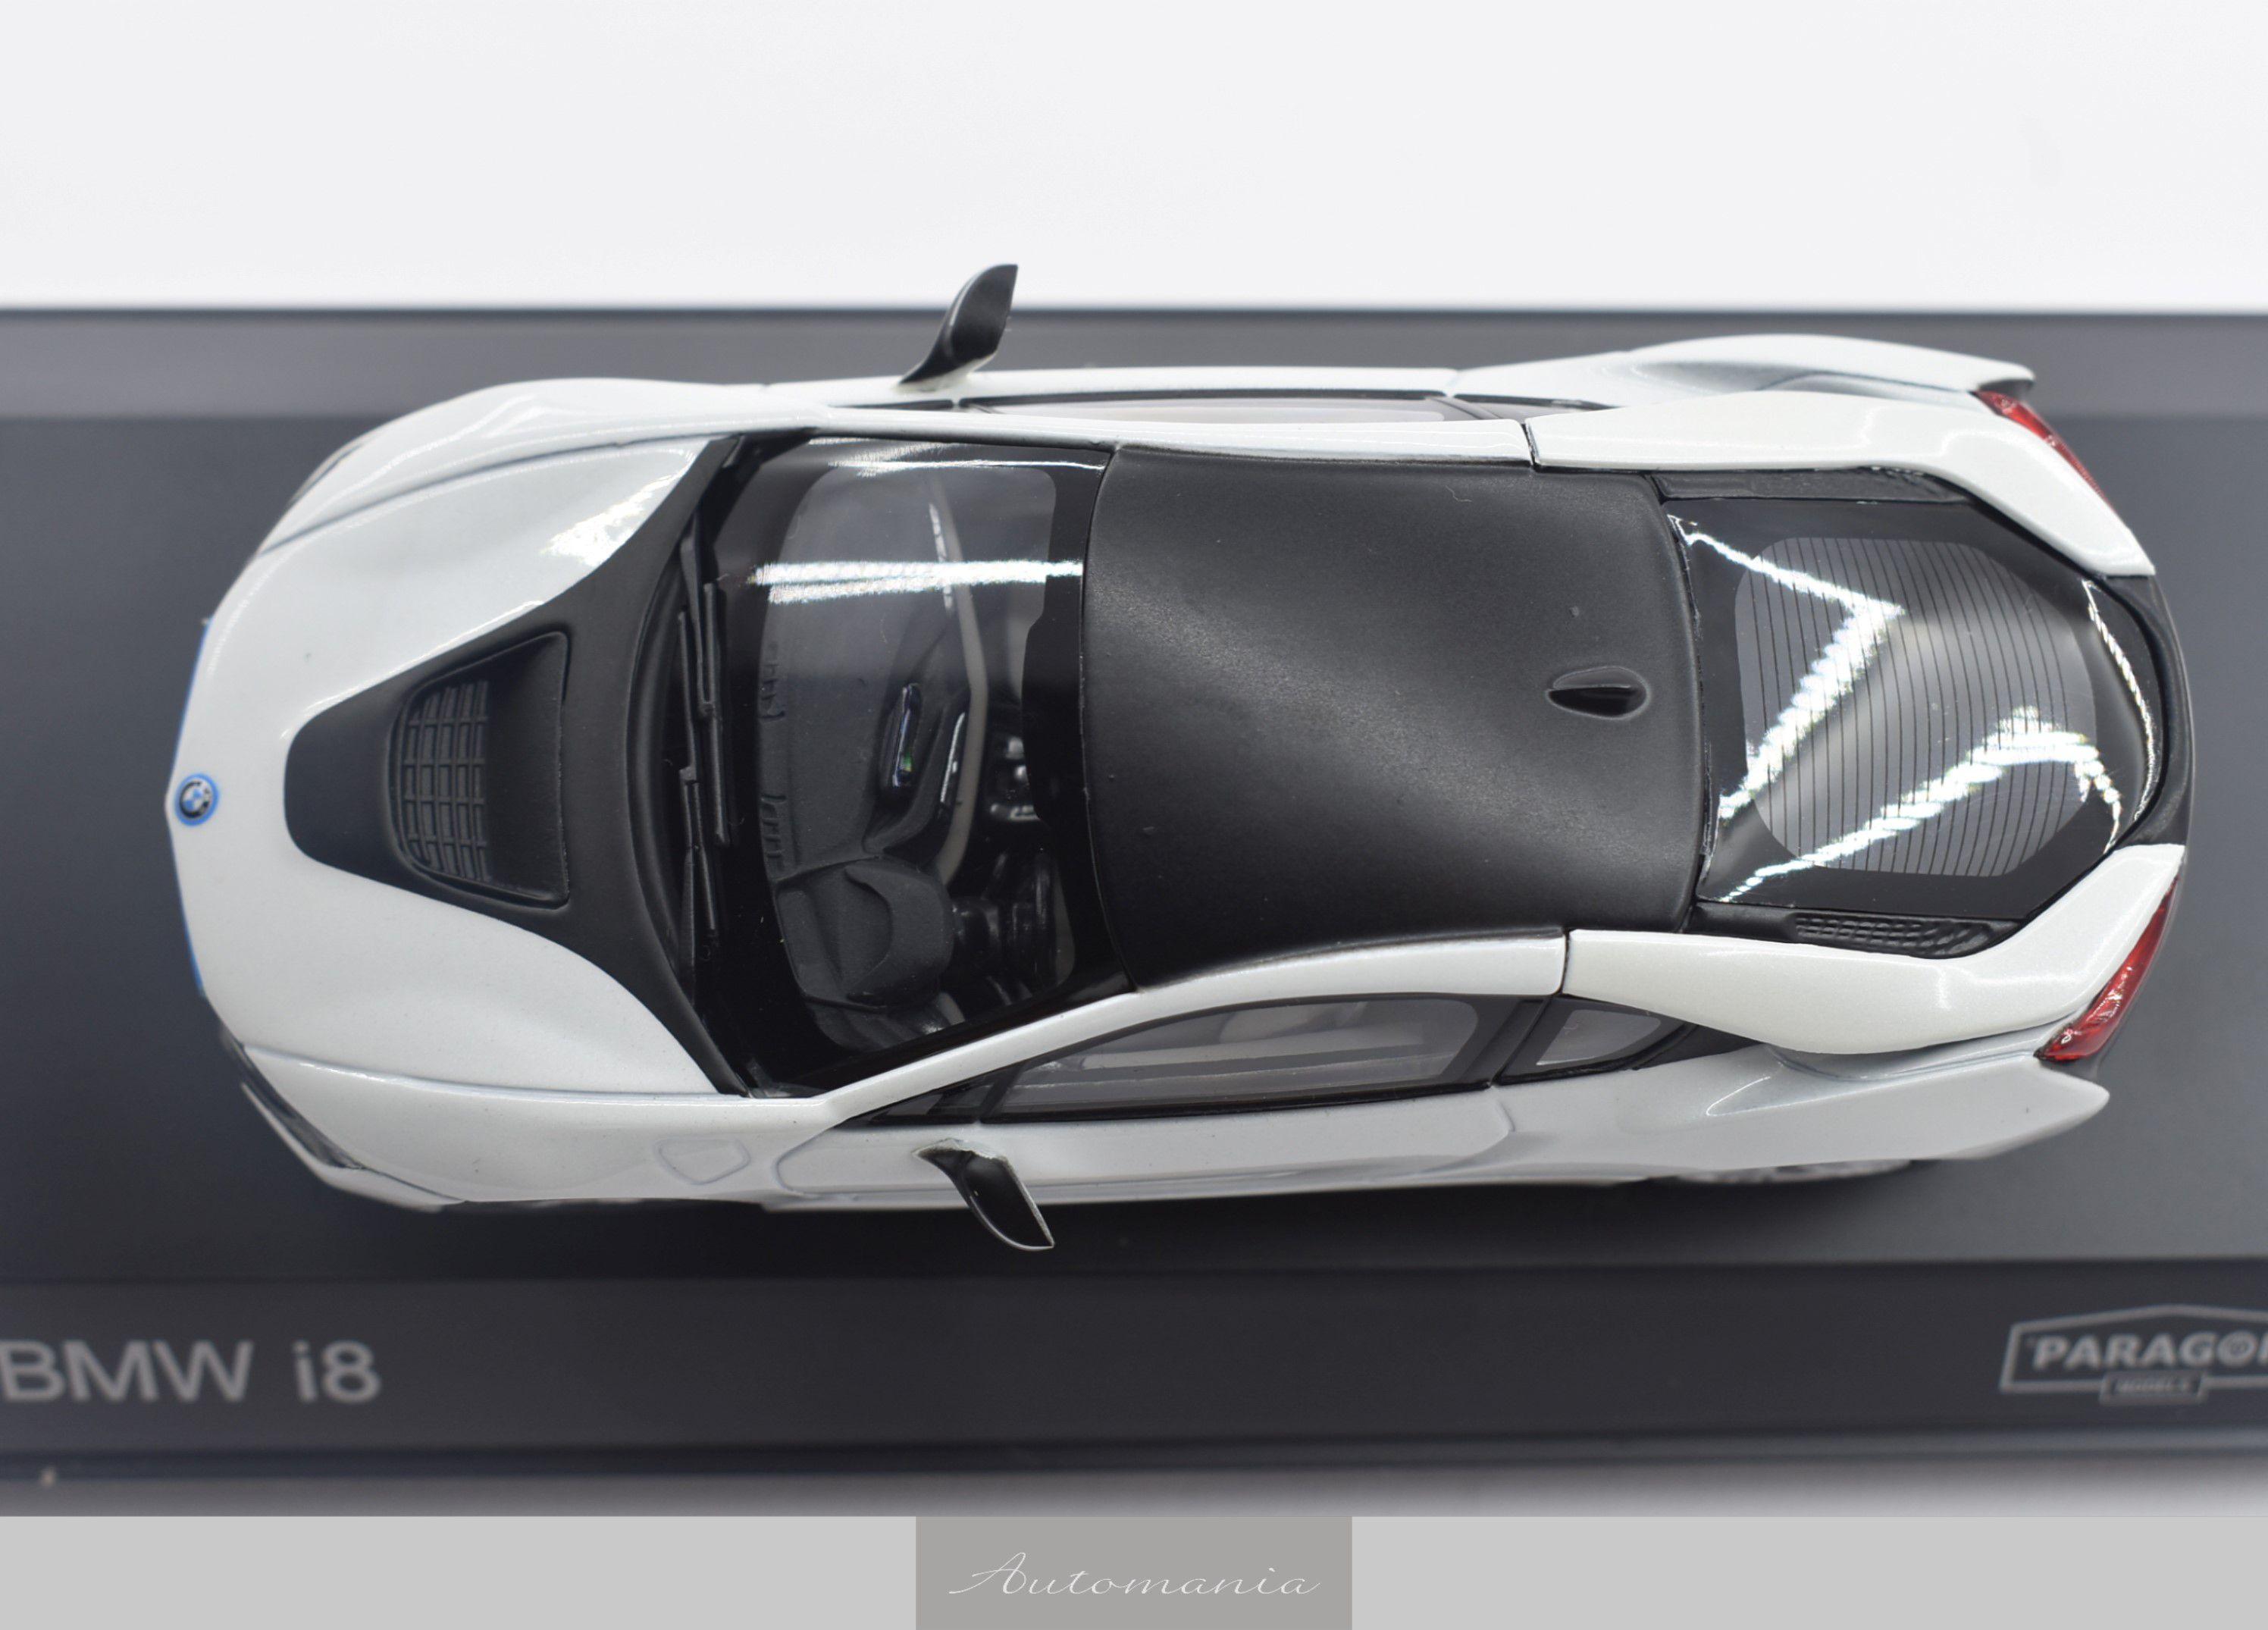 BMW I8 Crystal White + Frozen Grey